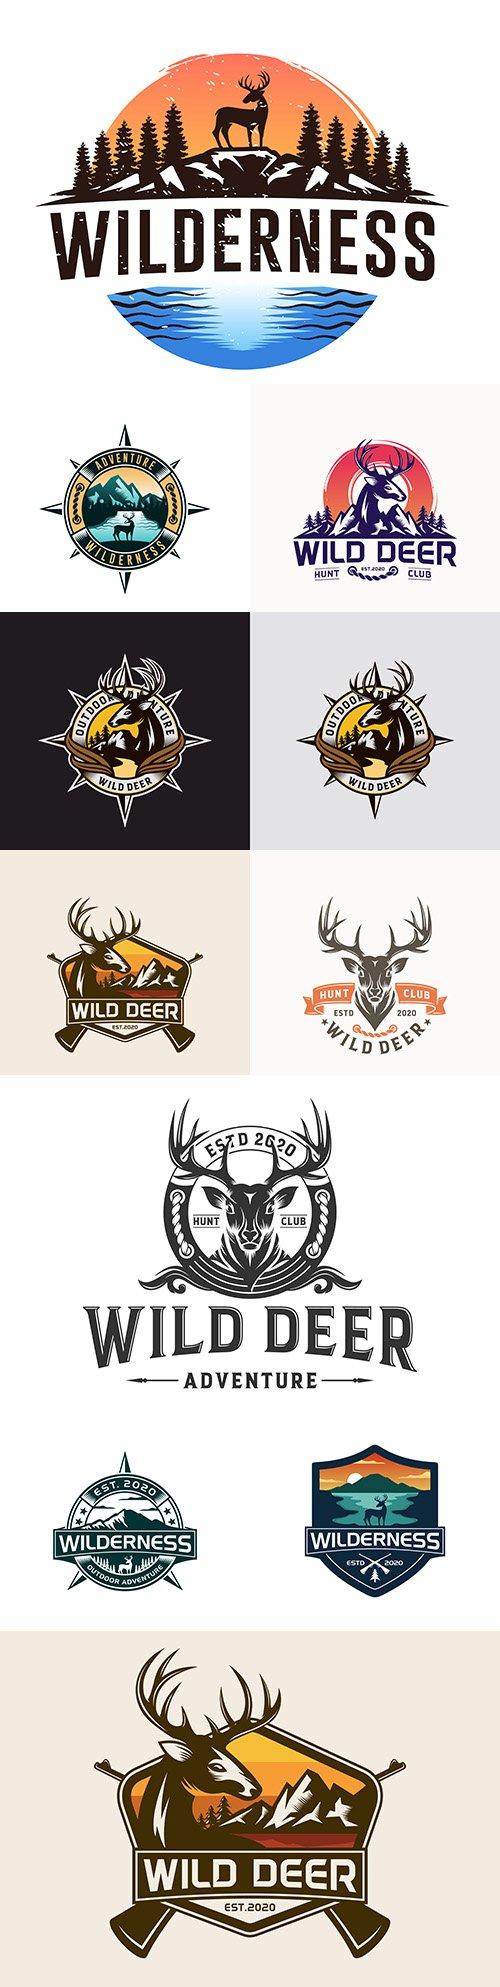 Wilderness brand name company logos corporate design